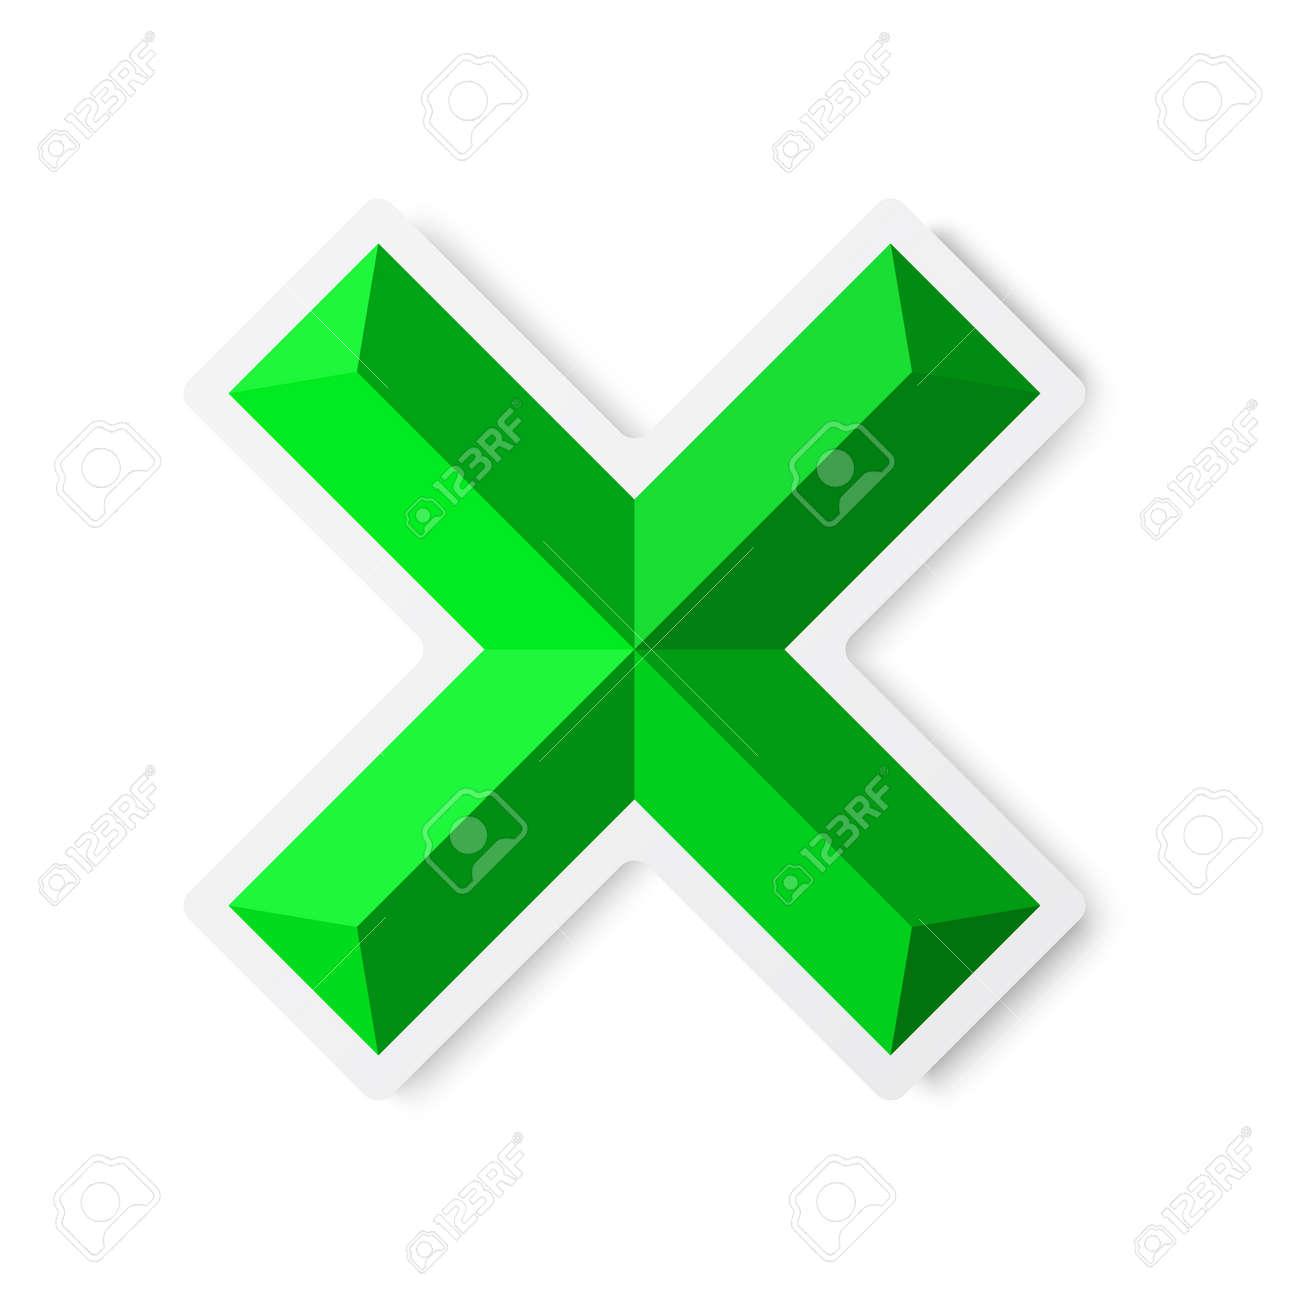 Check mark, cross, isolated on white, illustration